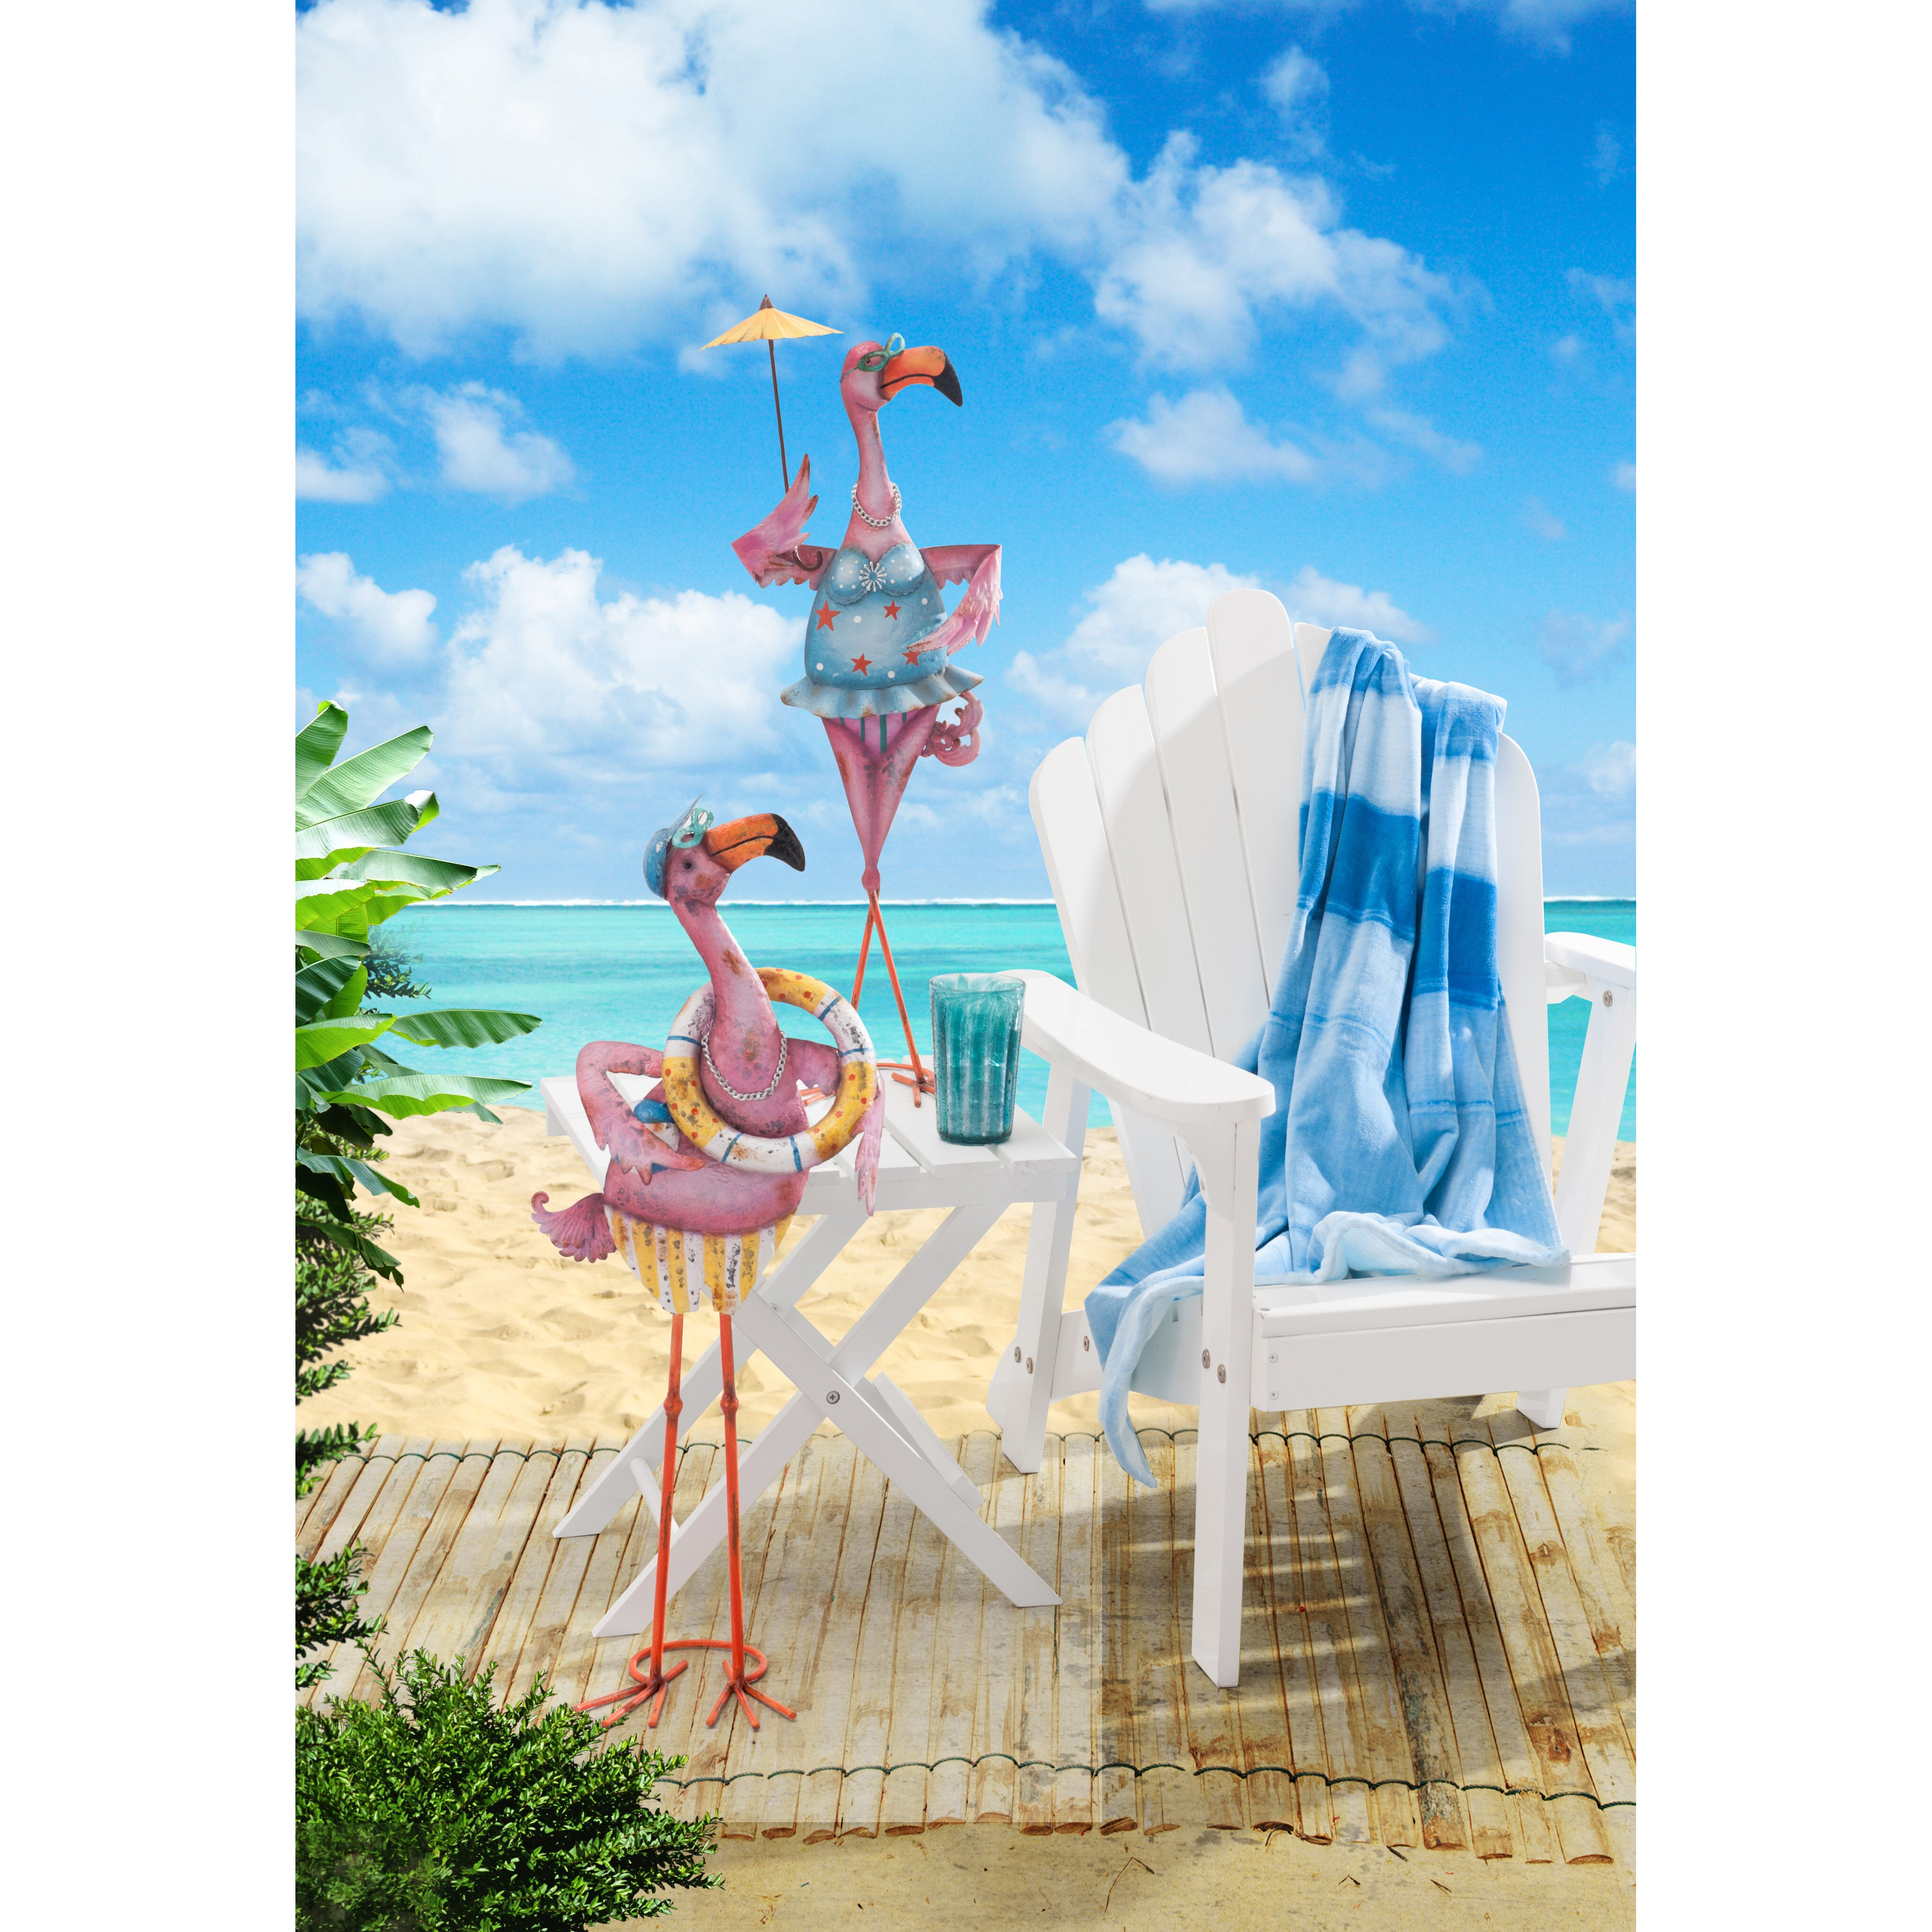 California Pizza Kitchen Garden Walk Sunjoy Eccentric 2 Piece Flamingo Couple Garden Statue Set